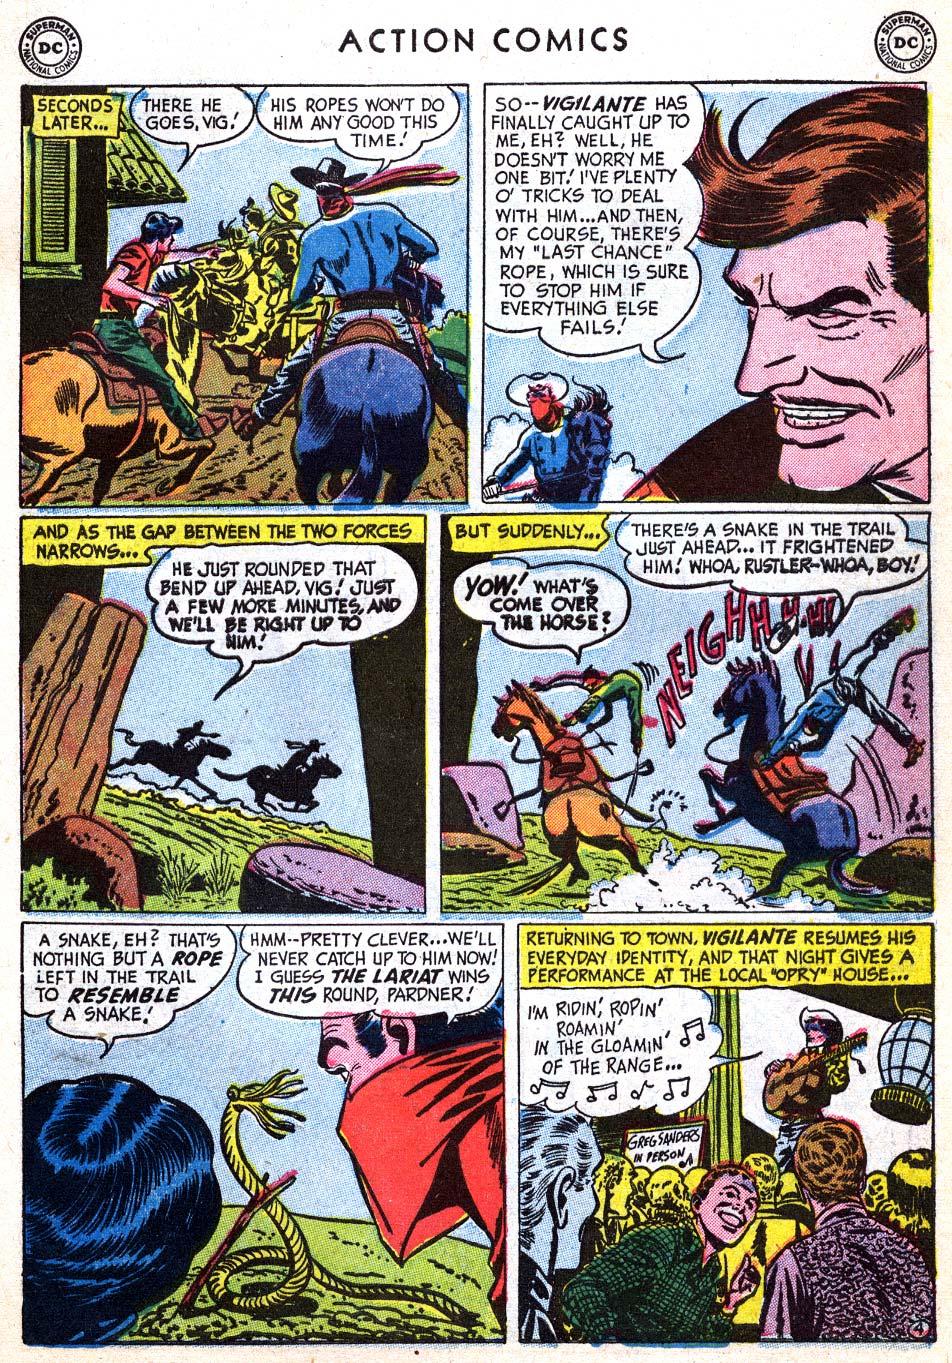 Action Comics (1938) 182 Page 36